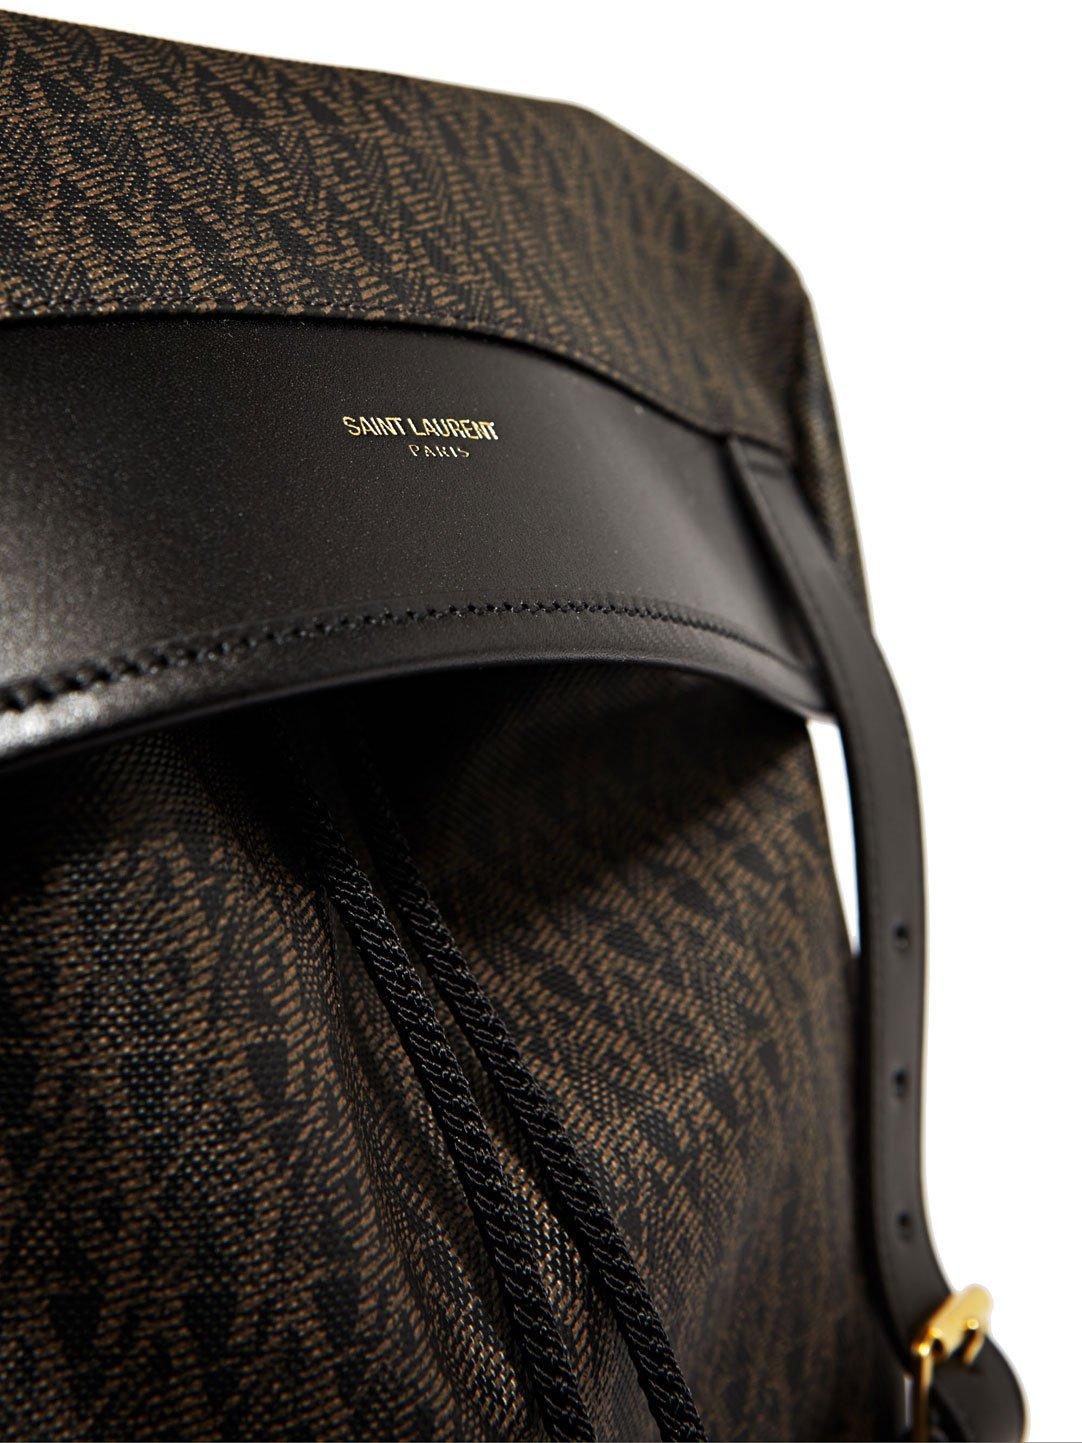 ysl vavin black classic leather bags - yves saint laurent camouflage backpack, ysl handbag